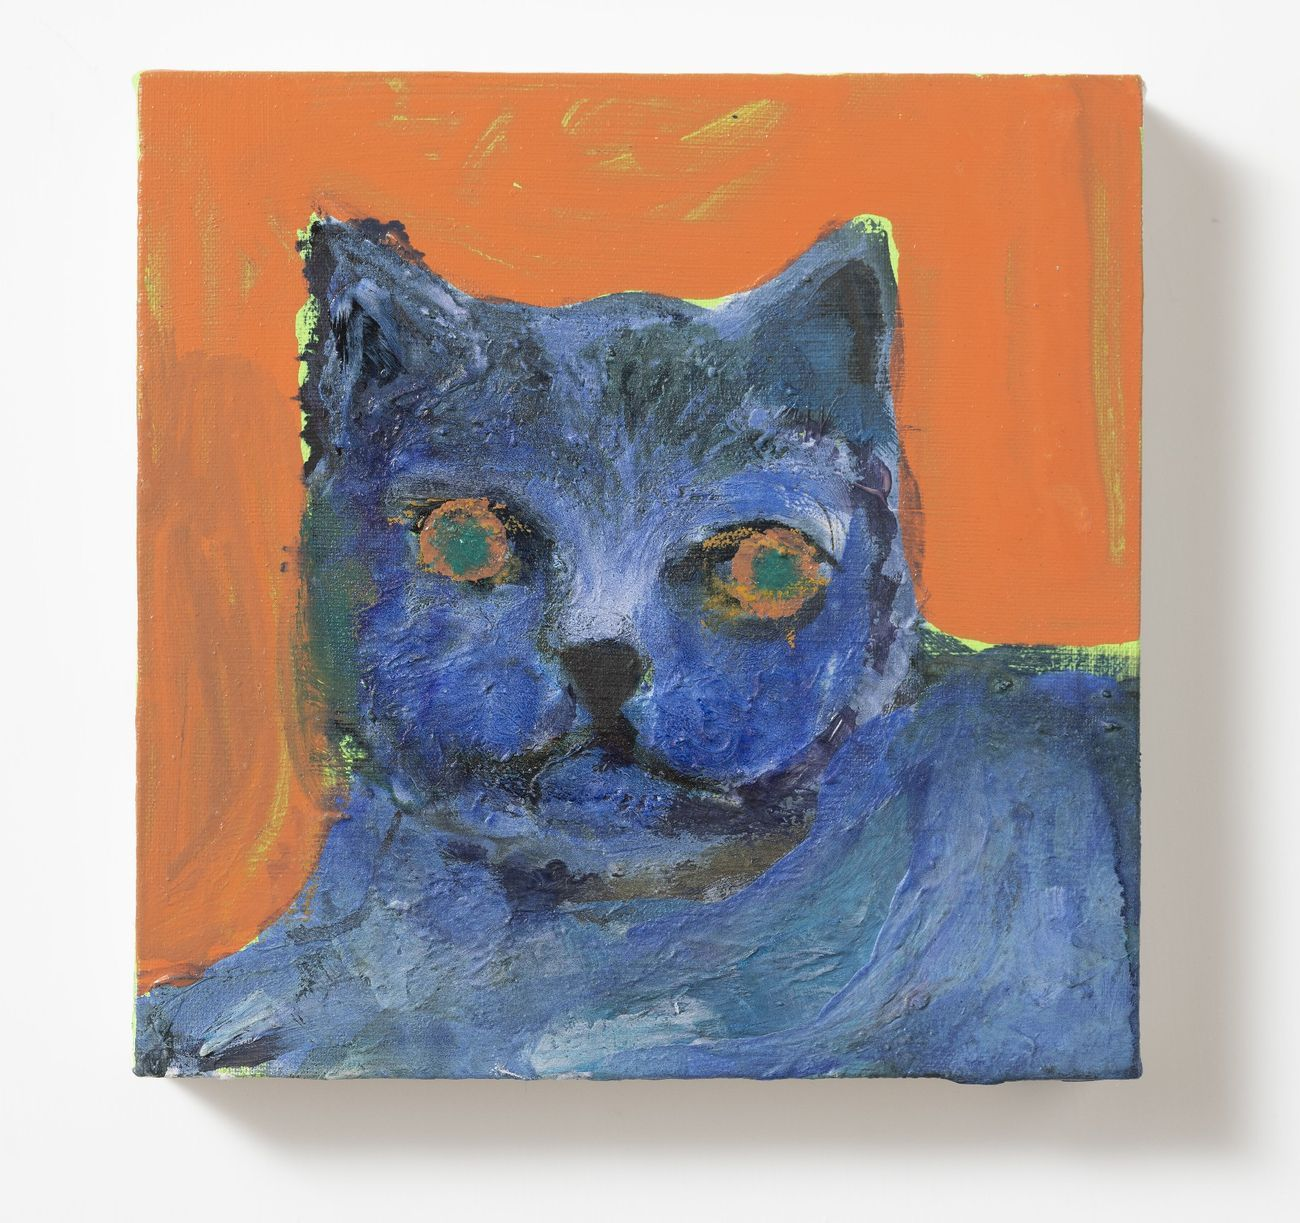 Silvia Argiolas, Blue Cat, 2020, acrilico su tela, 20x20 cm. Courtesy Galleria Richter Fine Art, Roma